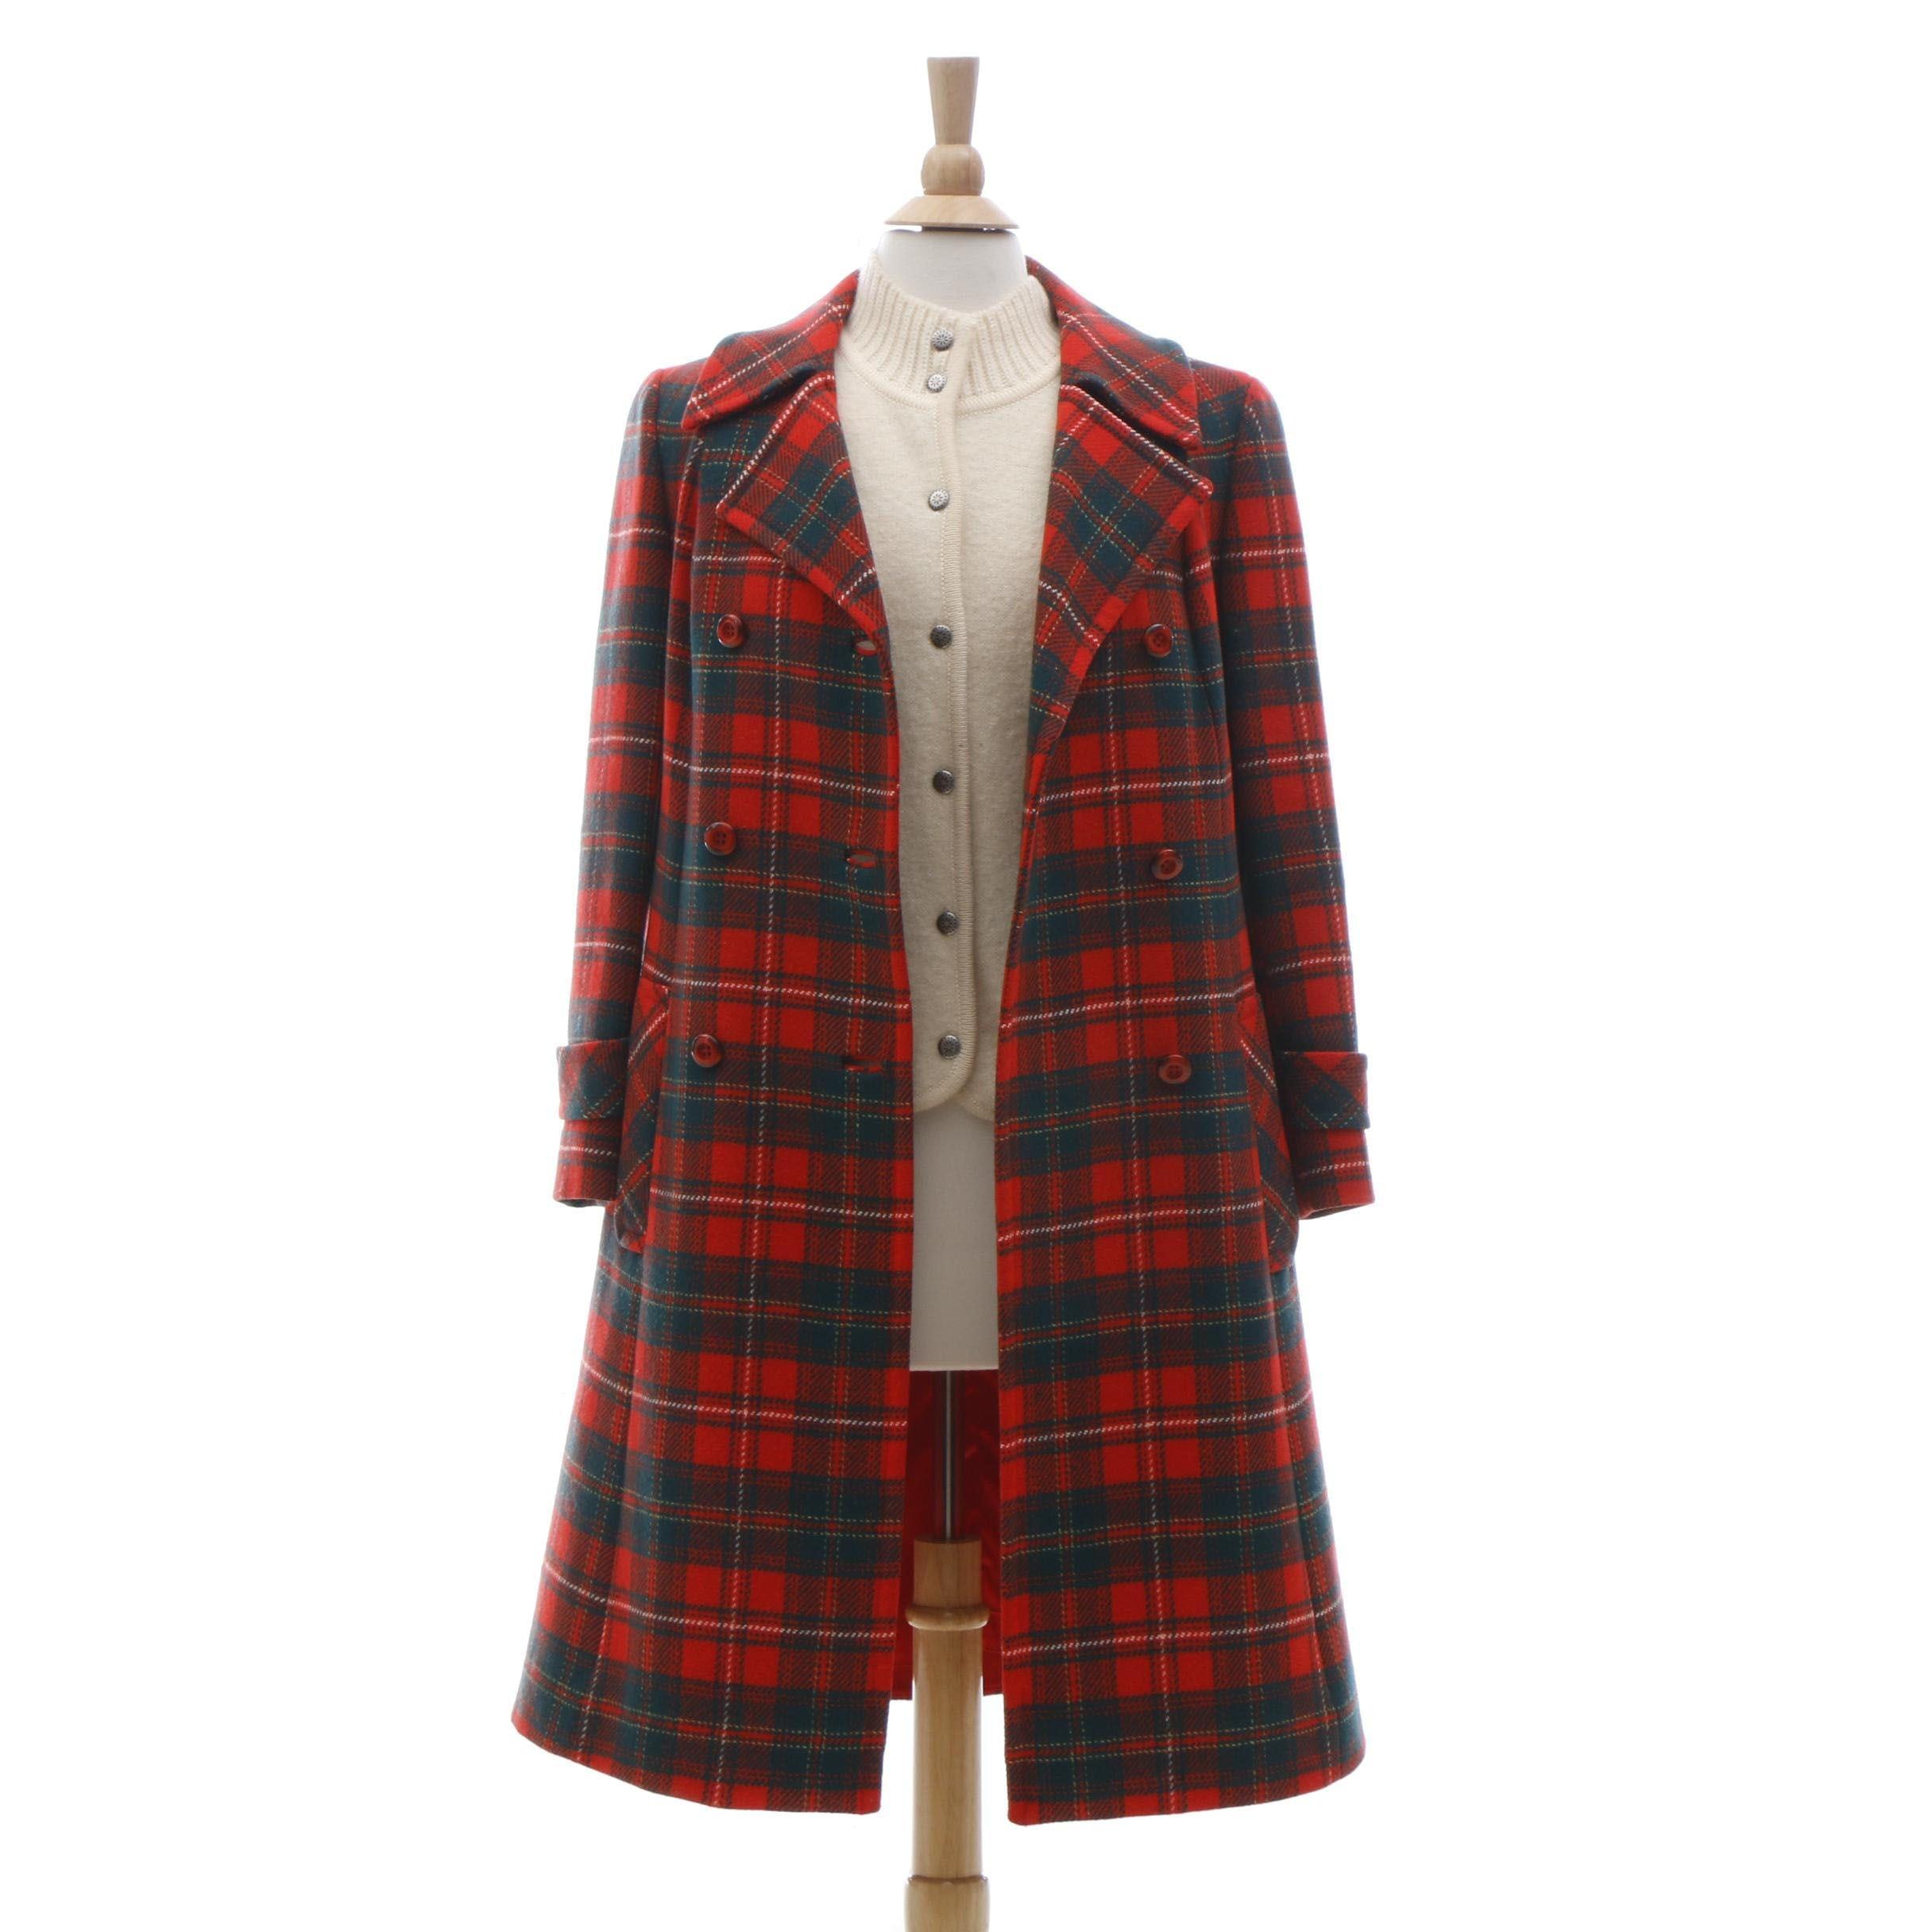 Pendleton Plaid Wool Coat and Wool Vest